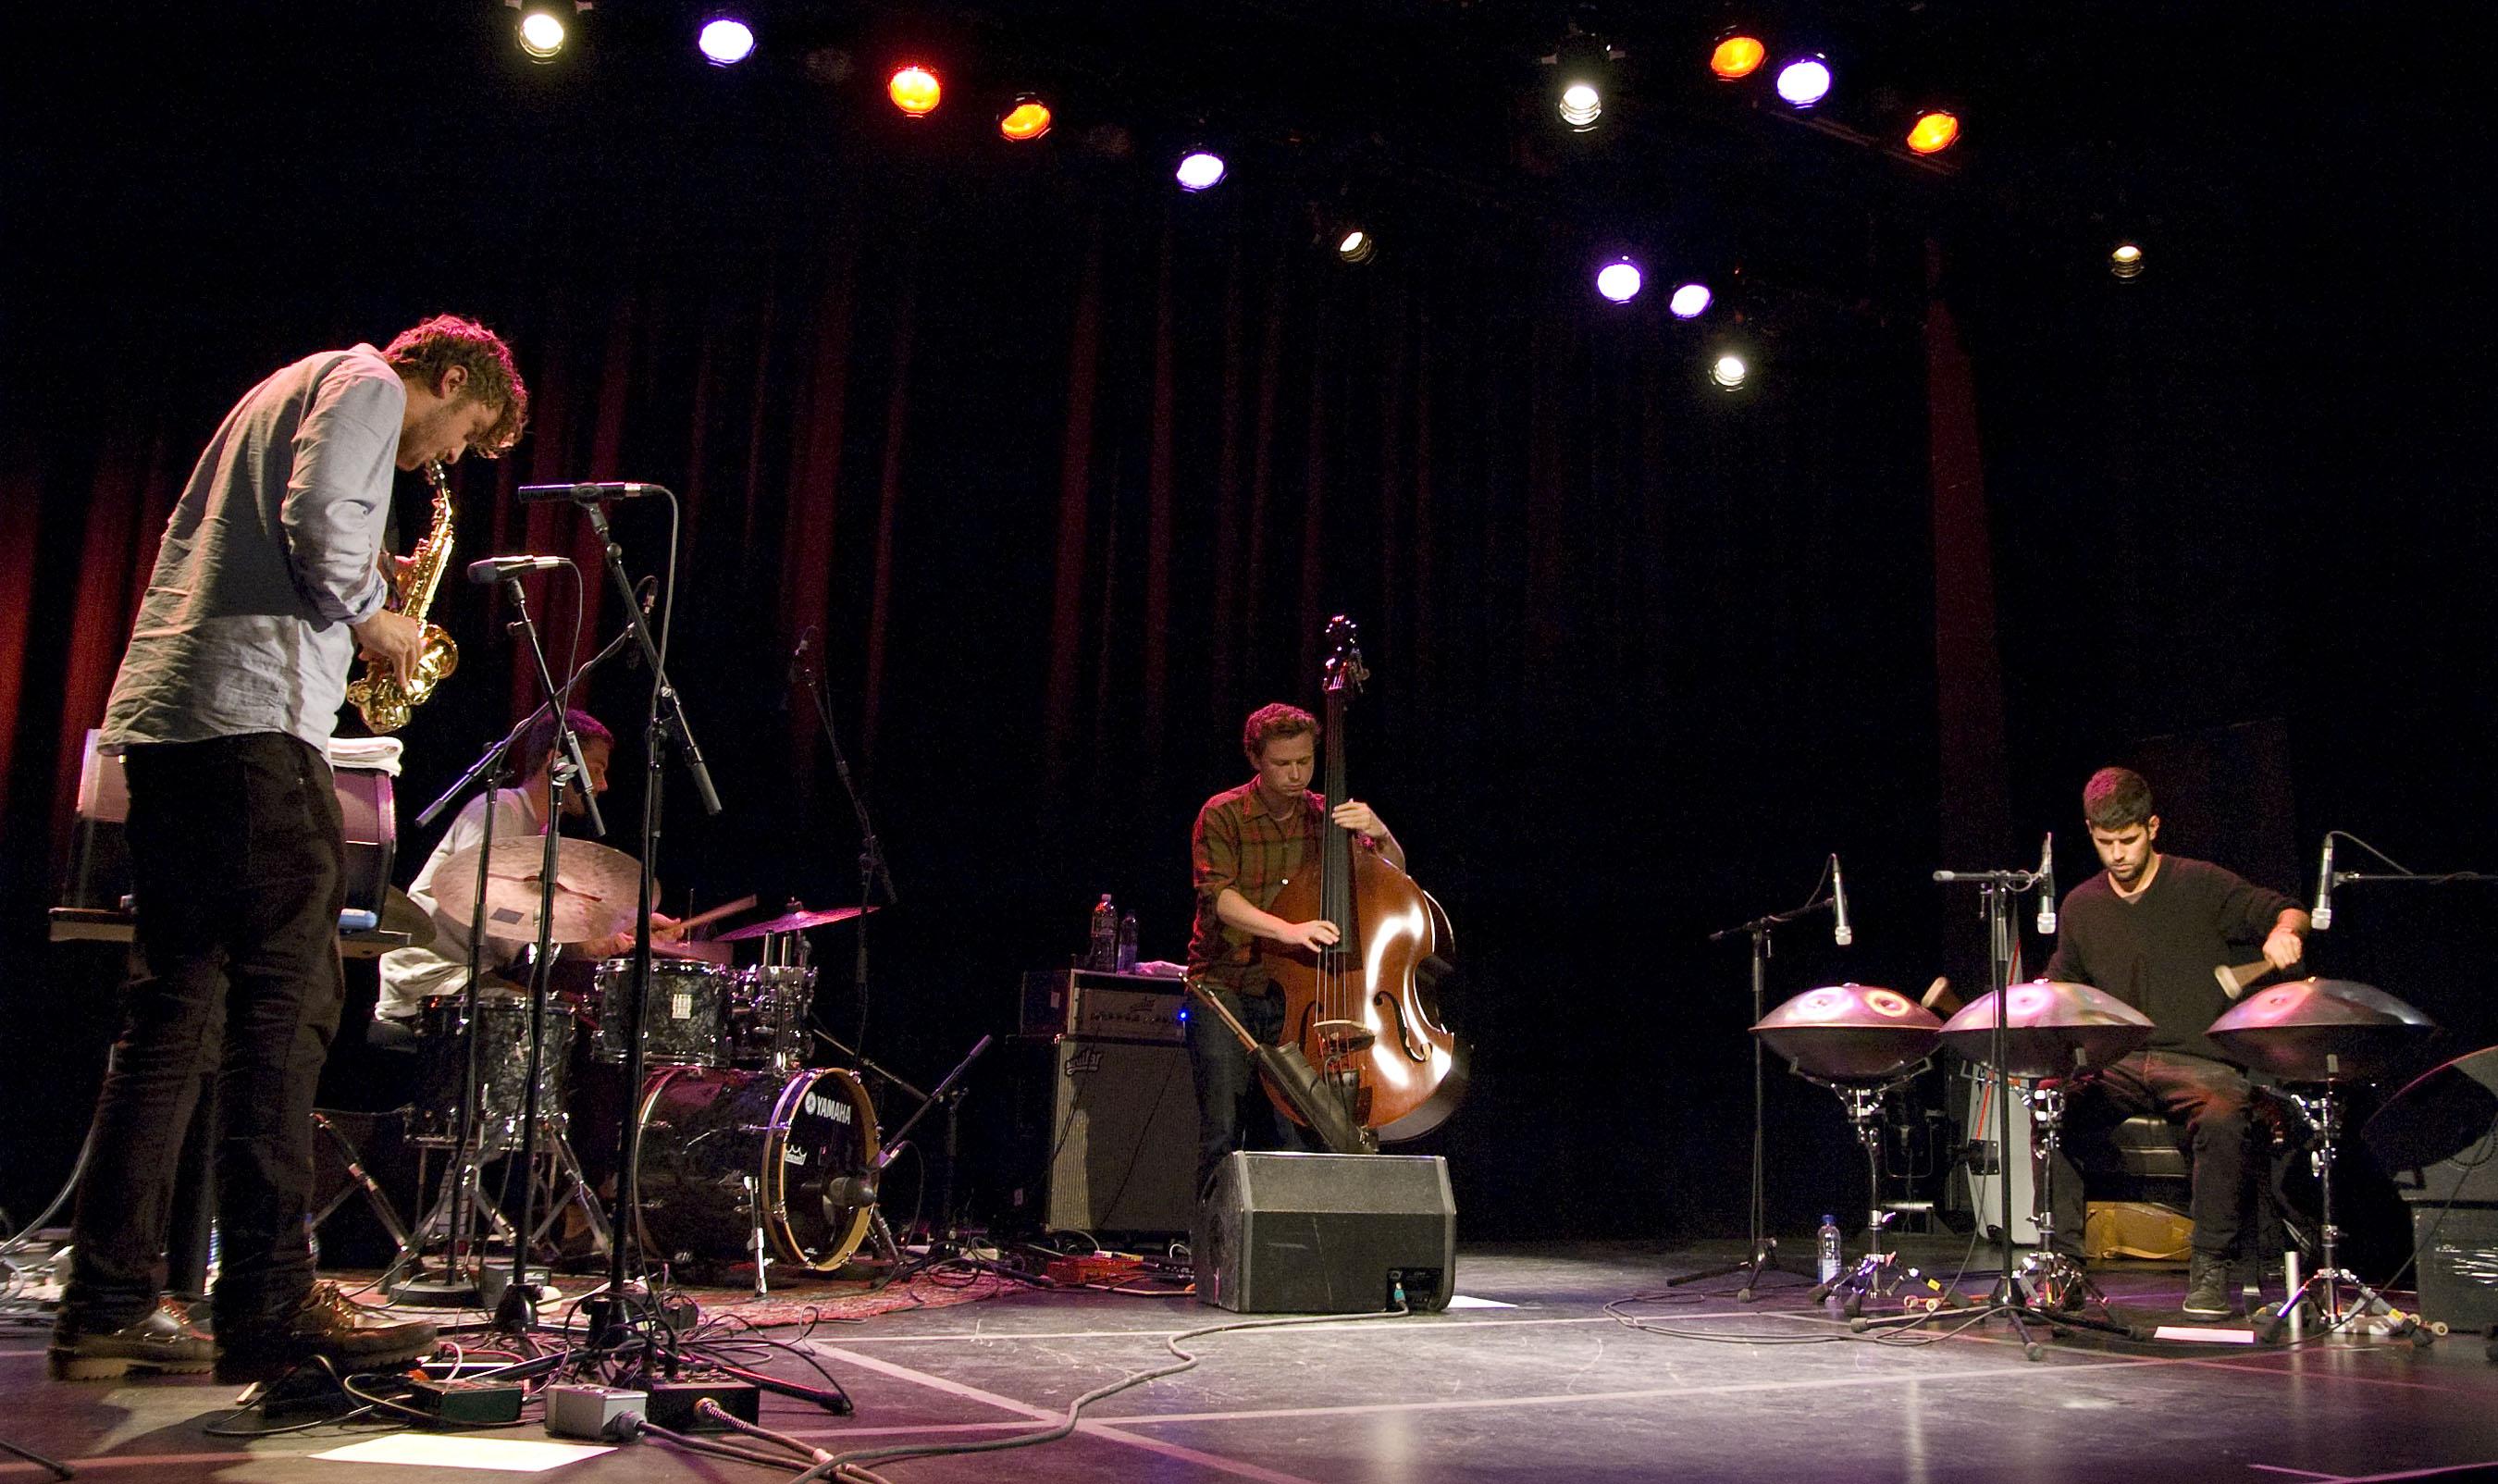 Portico Quartet, L'Astral, Montreal, Canada 10/02/2010